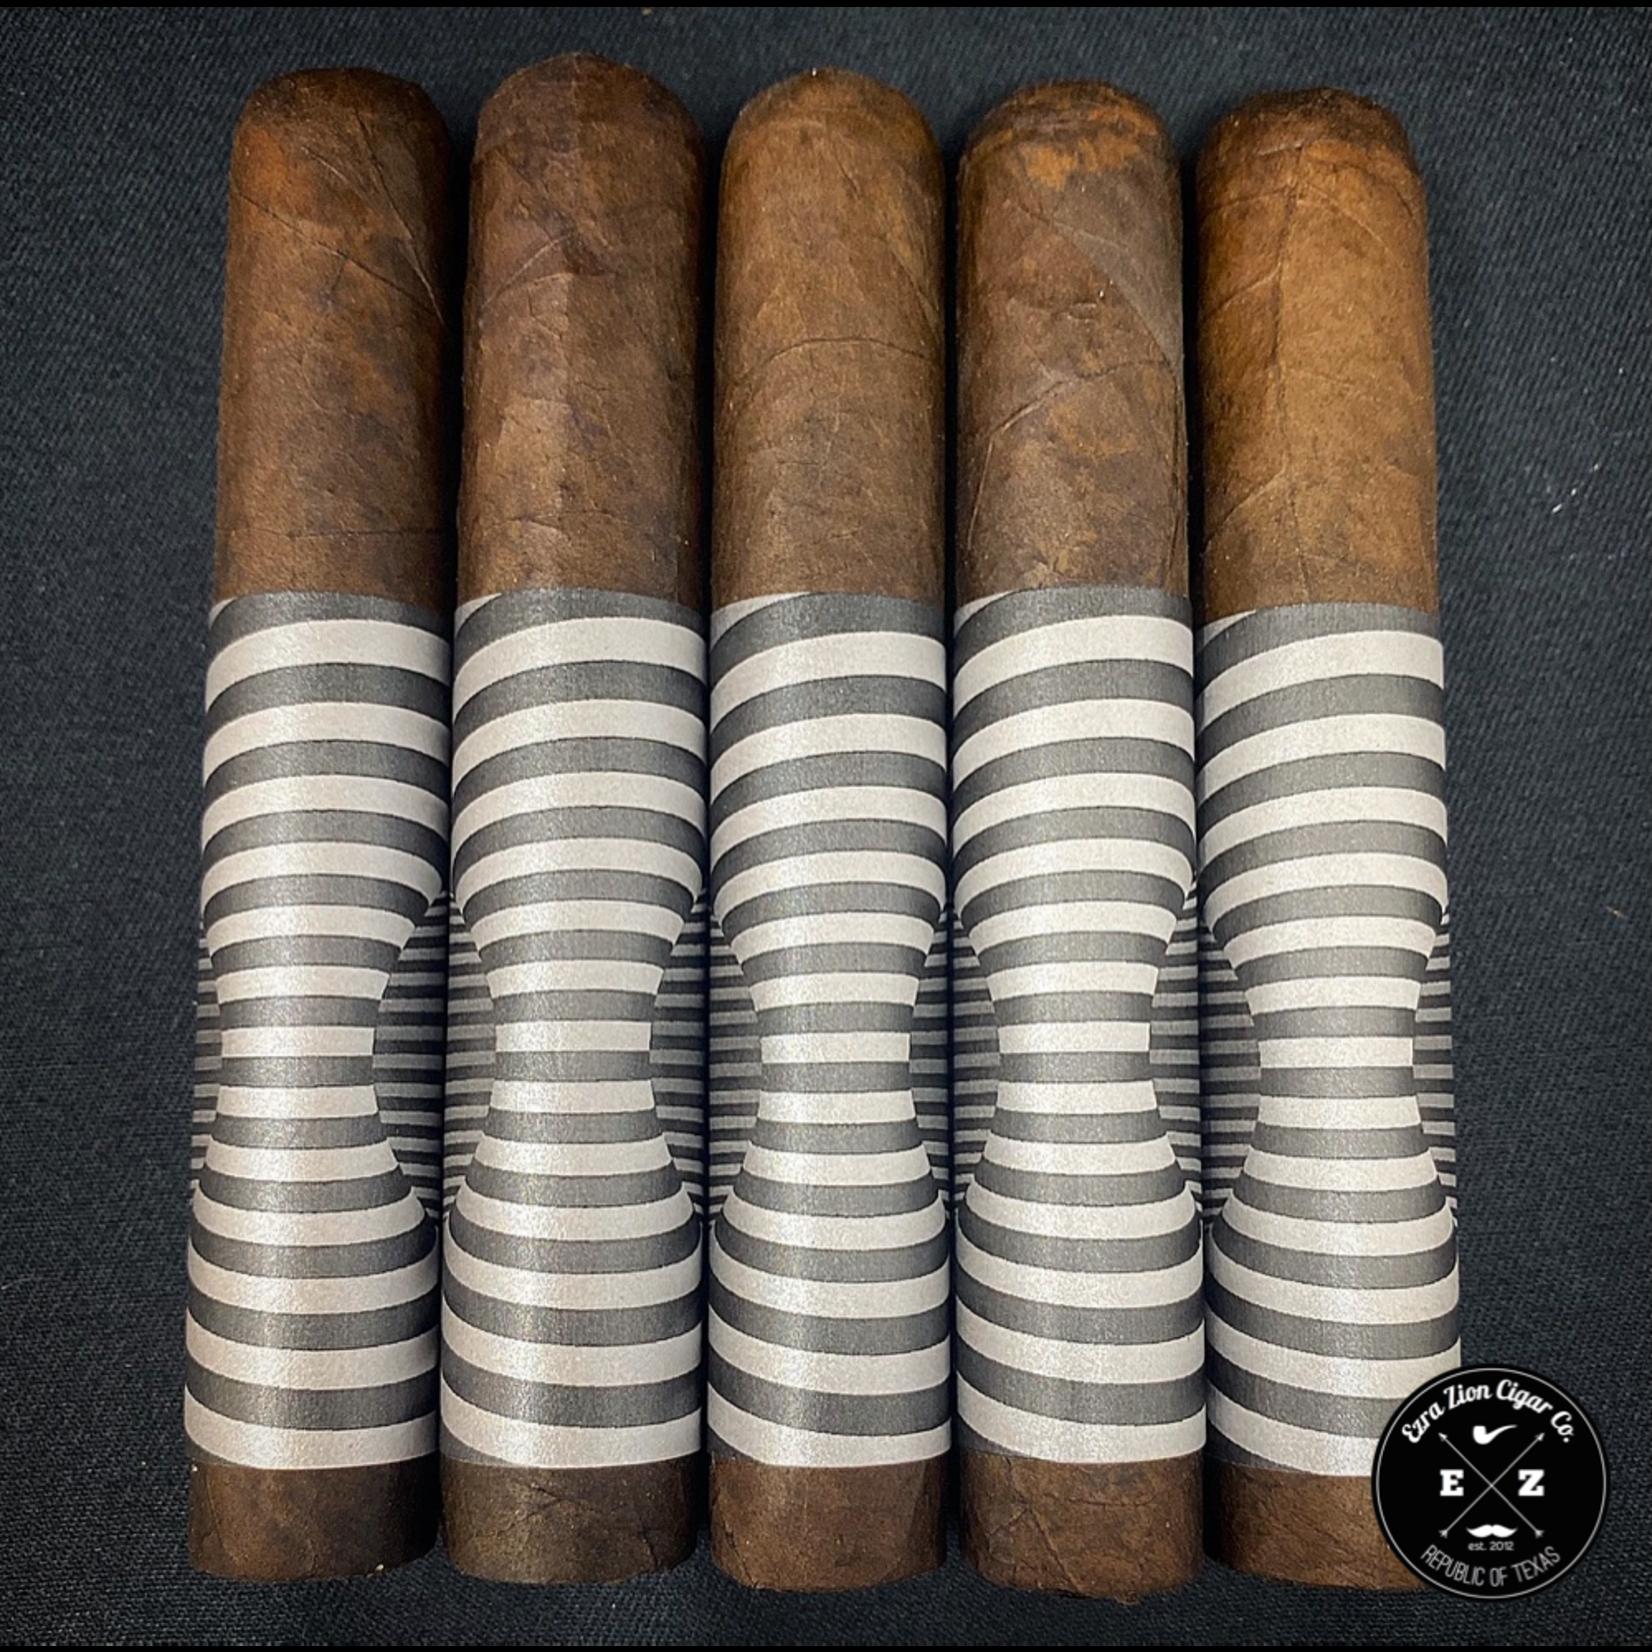 Ezra Zion Cigars Hypnotiq XQ